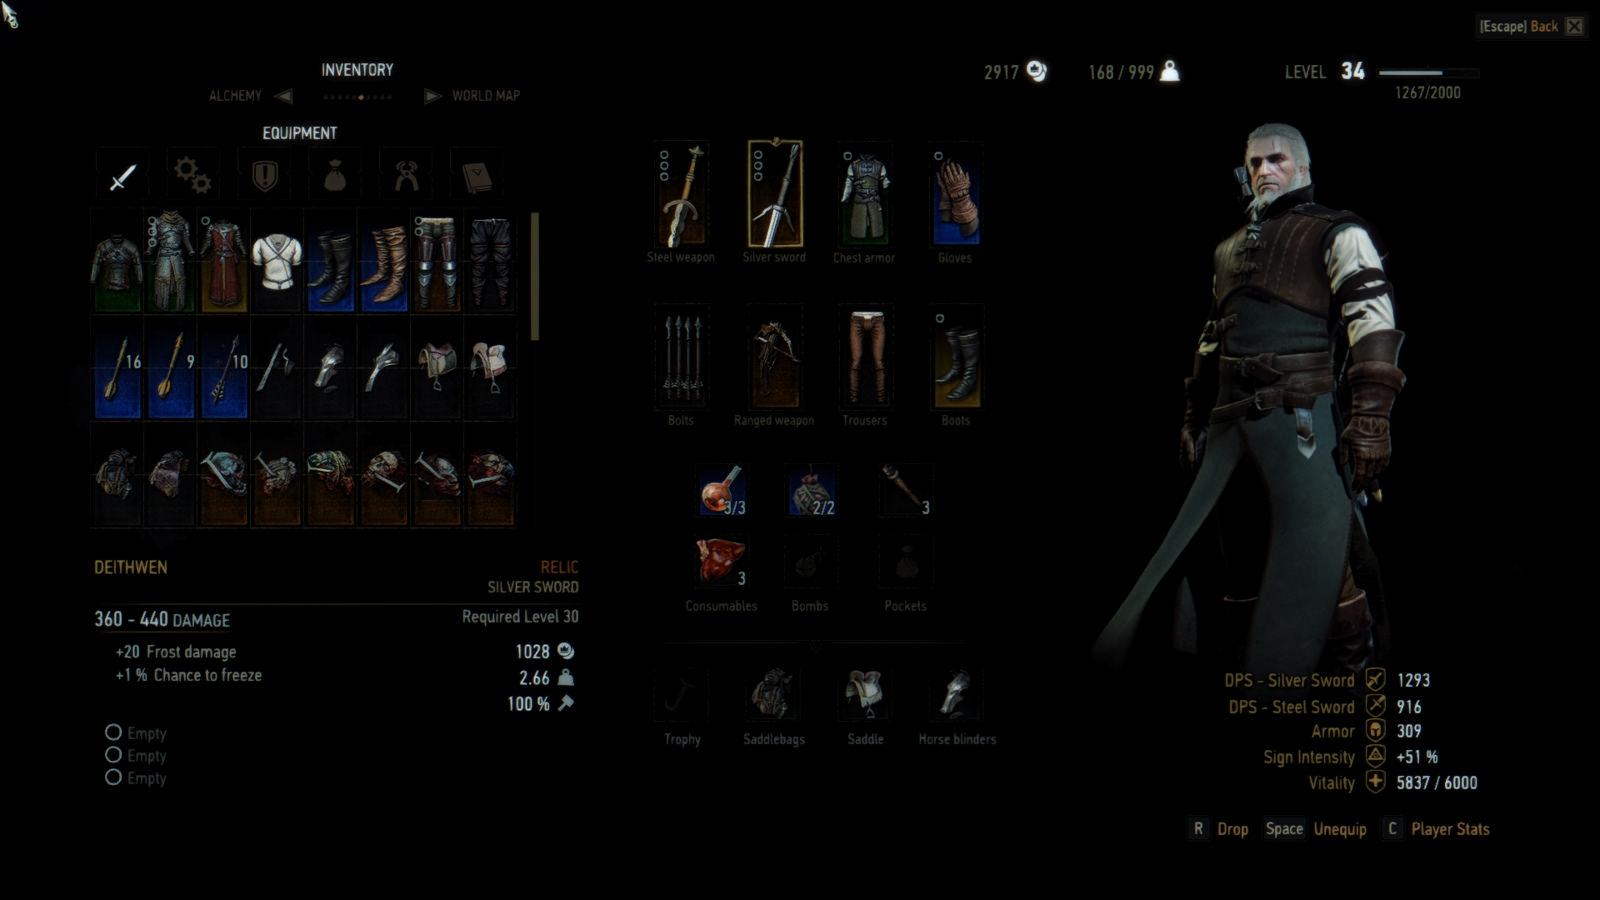 Best Witcher 3 Mods - Indestructible Items